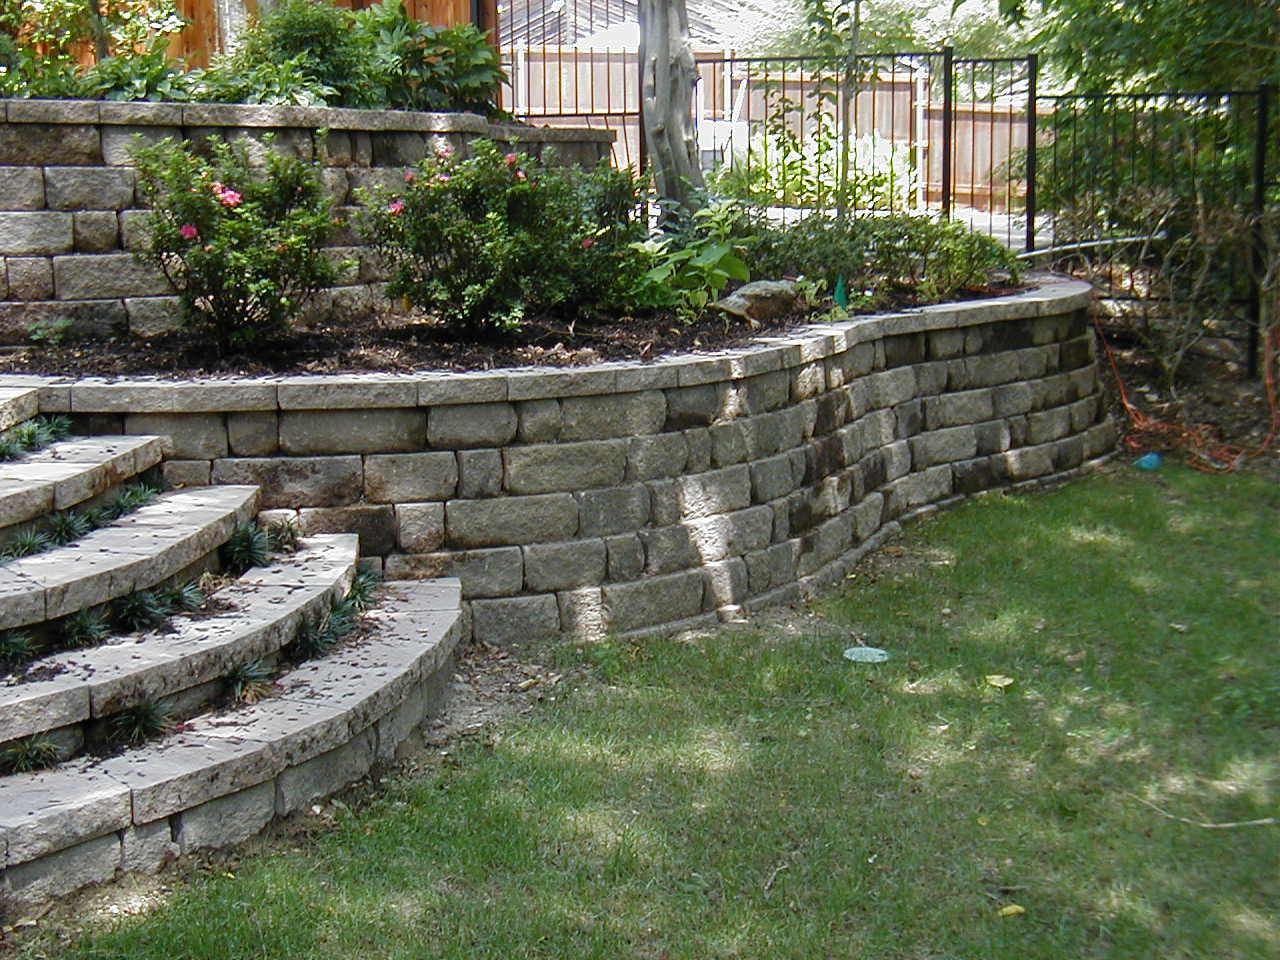 31 Adorable Retaining Wall Ideas | CreativeFan on Patio Stone Wall Ideas  id=15439